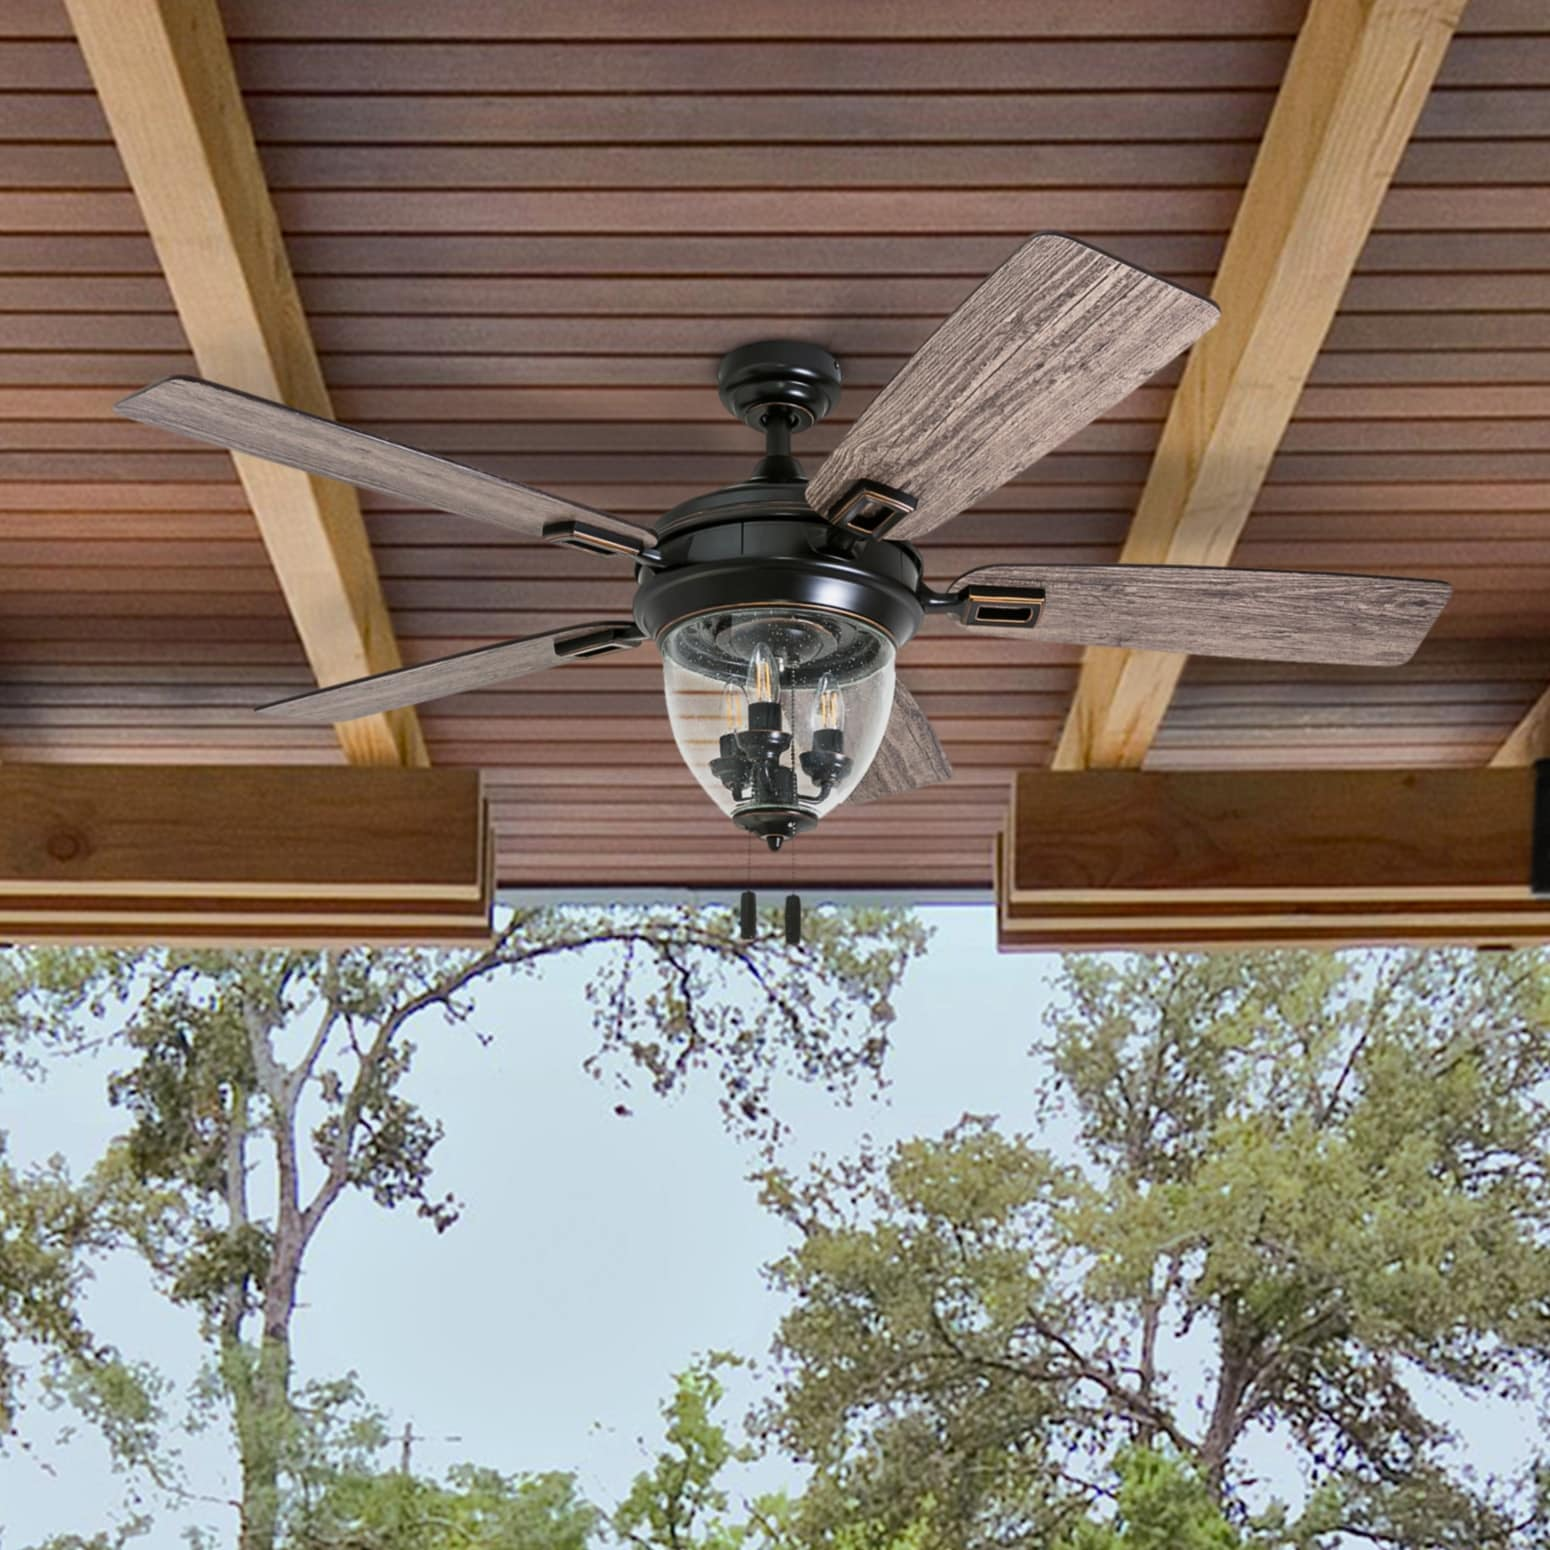 Shop Honeywell Glencrest Oil Rubbed Bronze Led Outdoor Ceiling Fan Overstock 25738840